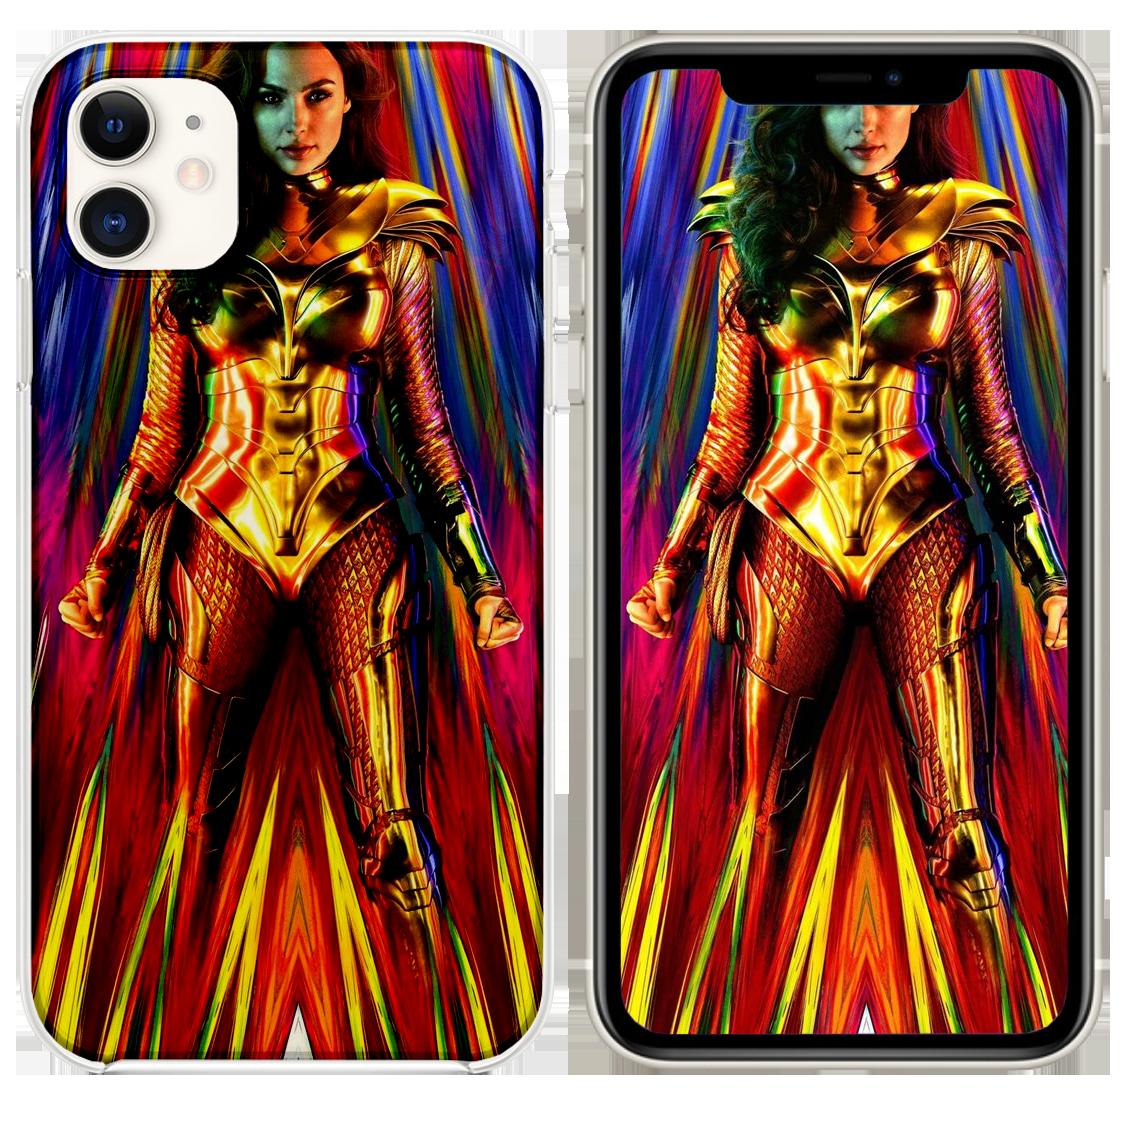 Wonder Woman 1984 8k iPhone 11 case Iphone 11 Wonder woman 1136x1136